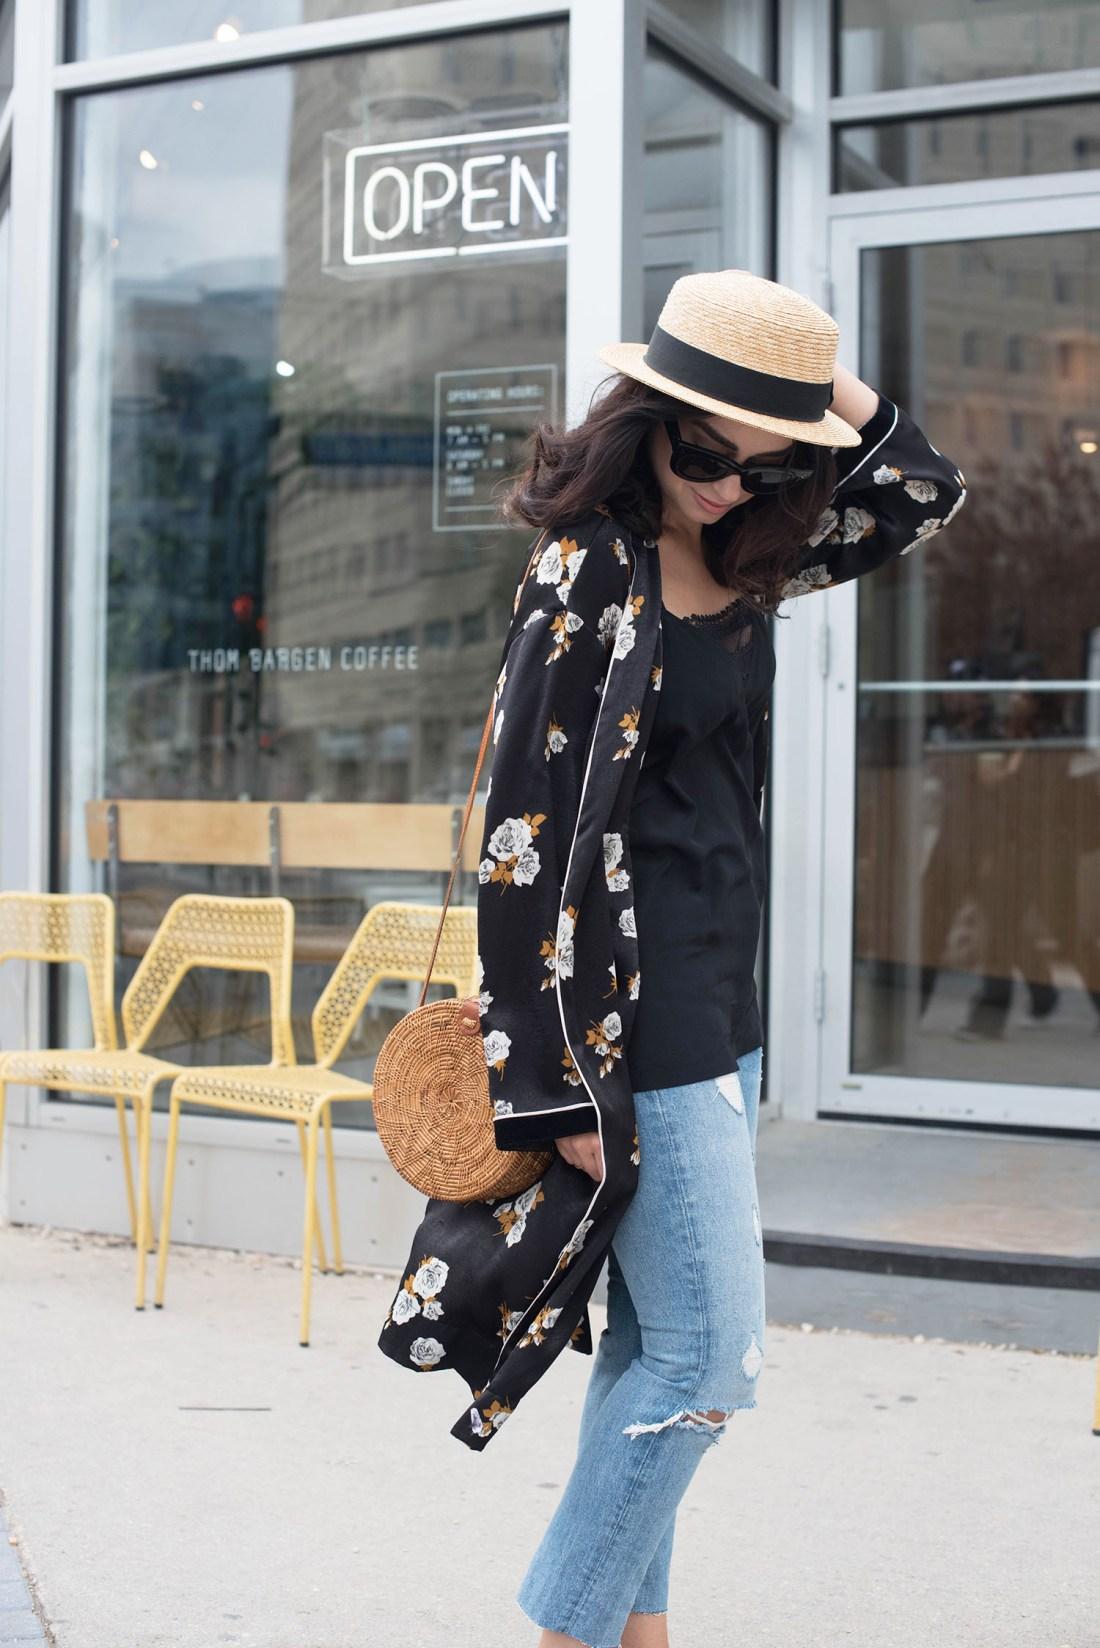 Fashion blogger Cee Fardoe of Coco & Vera holds onto her straw hat outside Thom Bargan coffee, wearing Grlfrnd Karolina jeans and a Zara black kimono